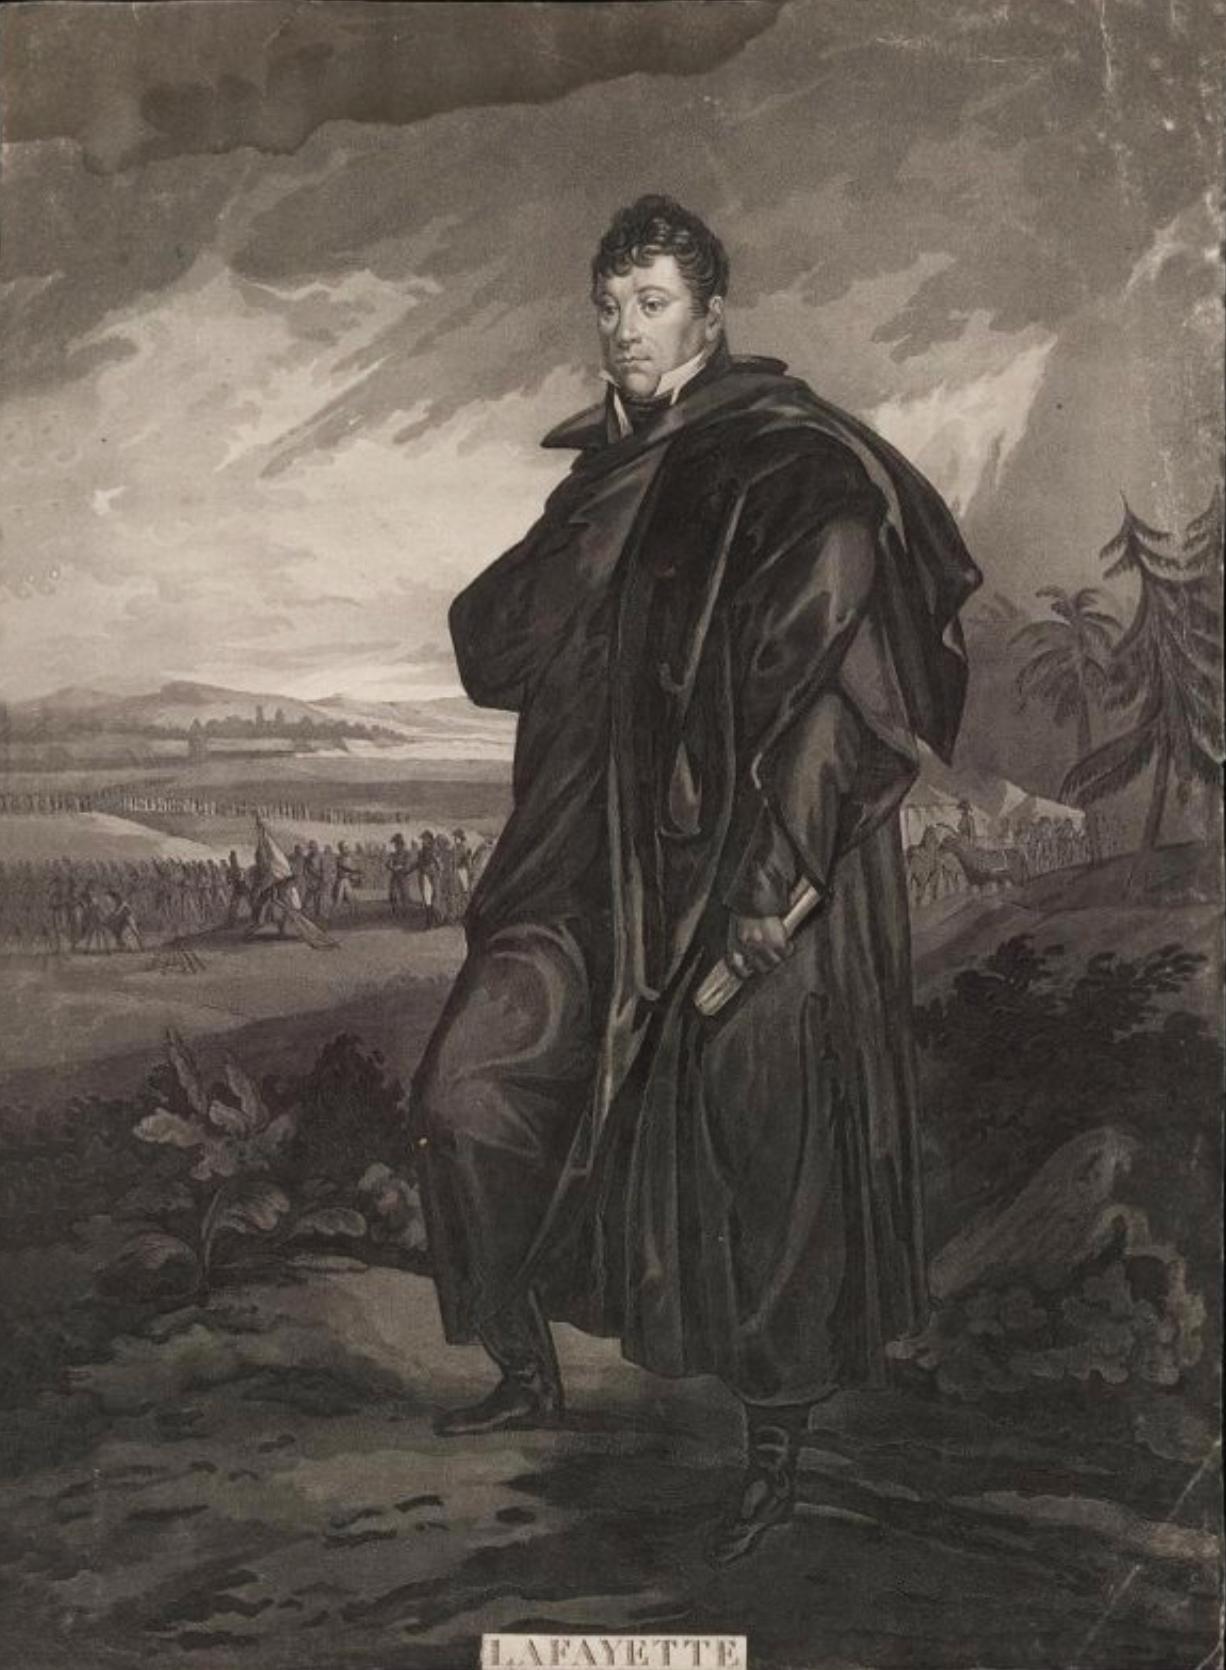 Портрет маркиза Лафайета Гравюра Л.Ф. Шарона по оригиналу П.Мартине, 1822